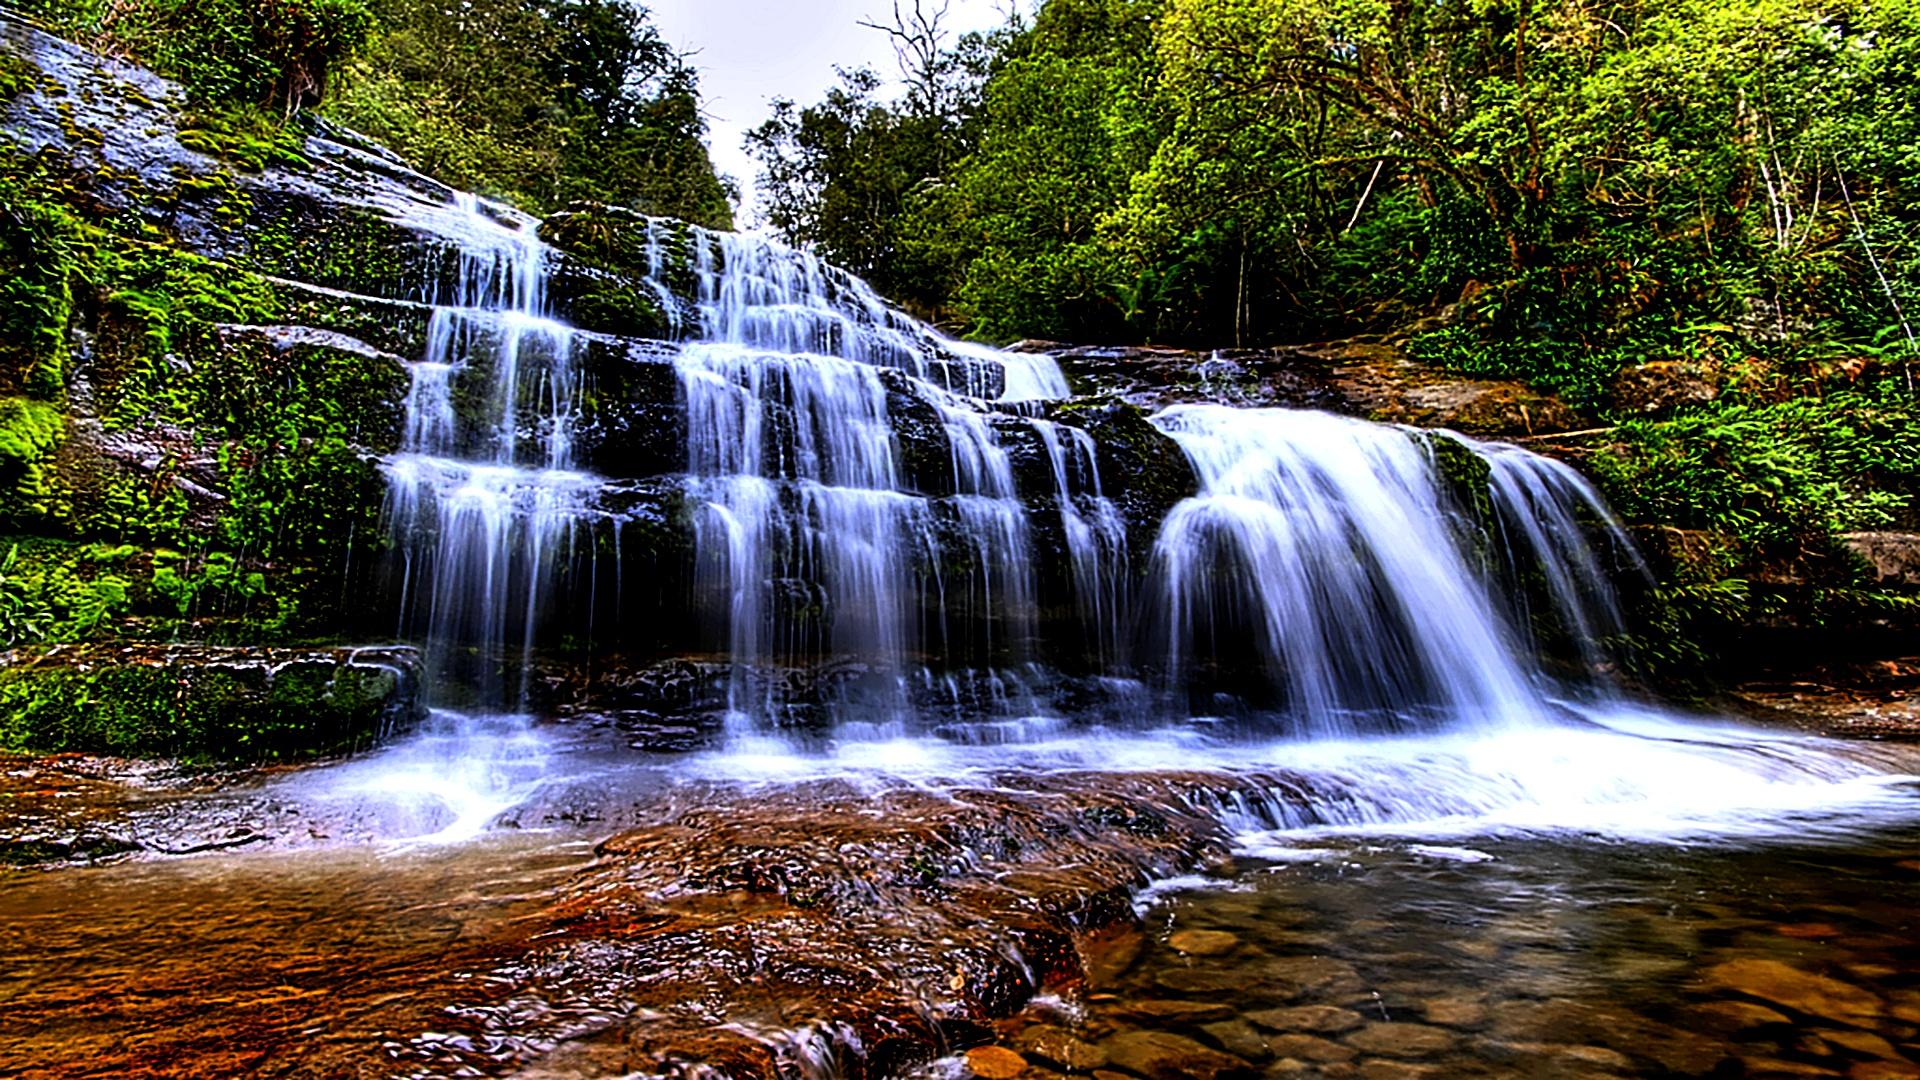 Wallpaper Waterfalls Great World 1920x1080